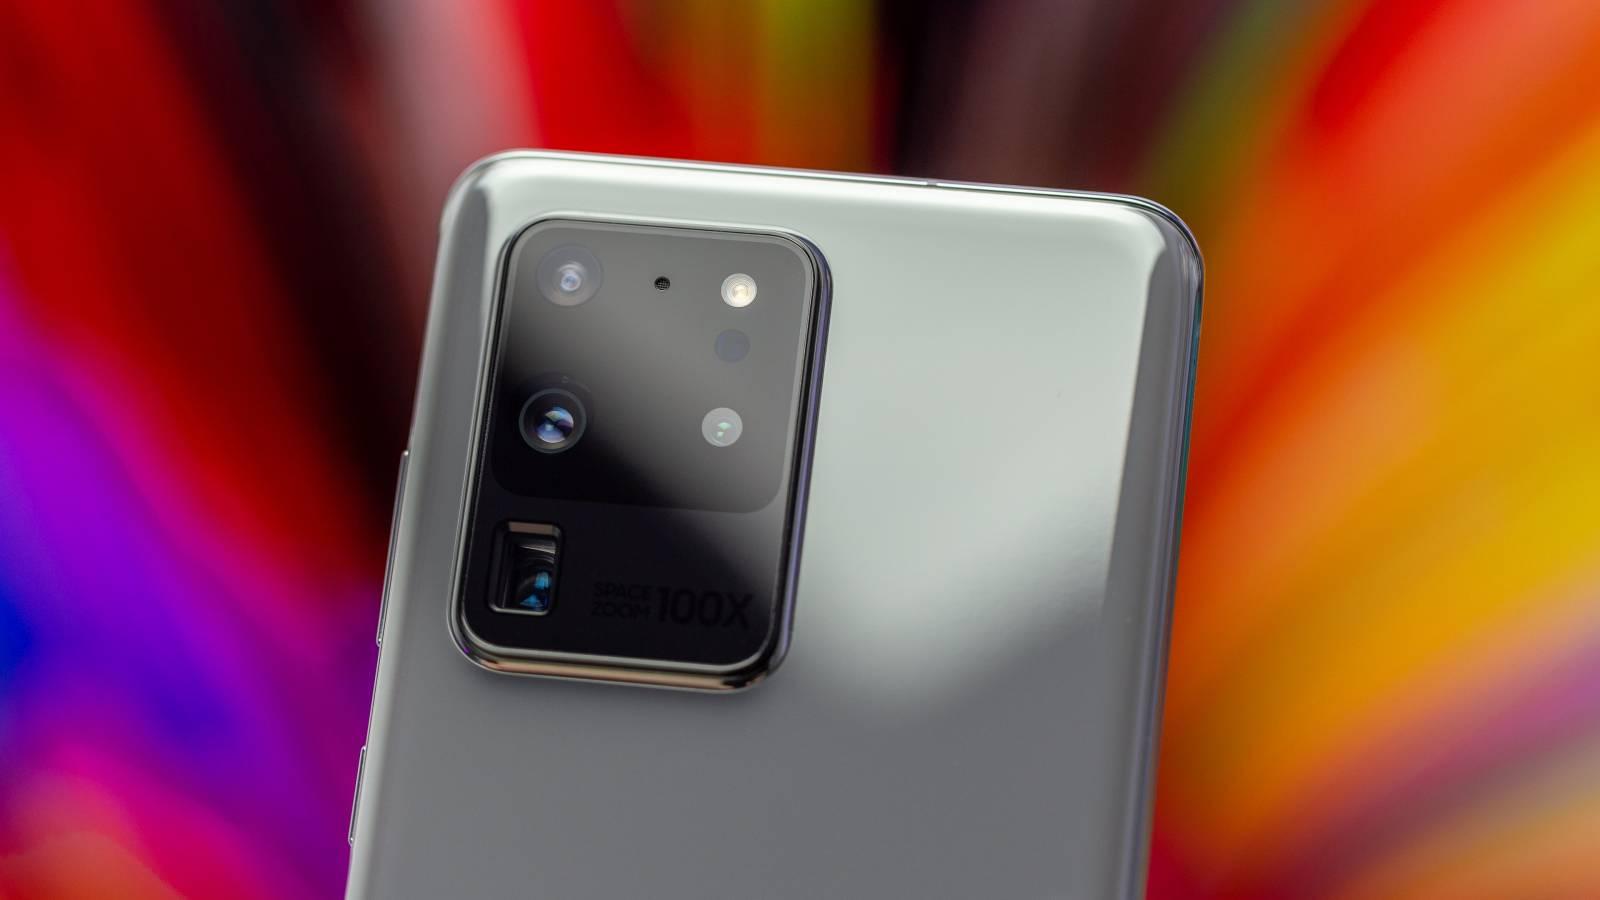 eMAG Samsung GALAXY S20 reducerei 1500 lei azi